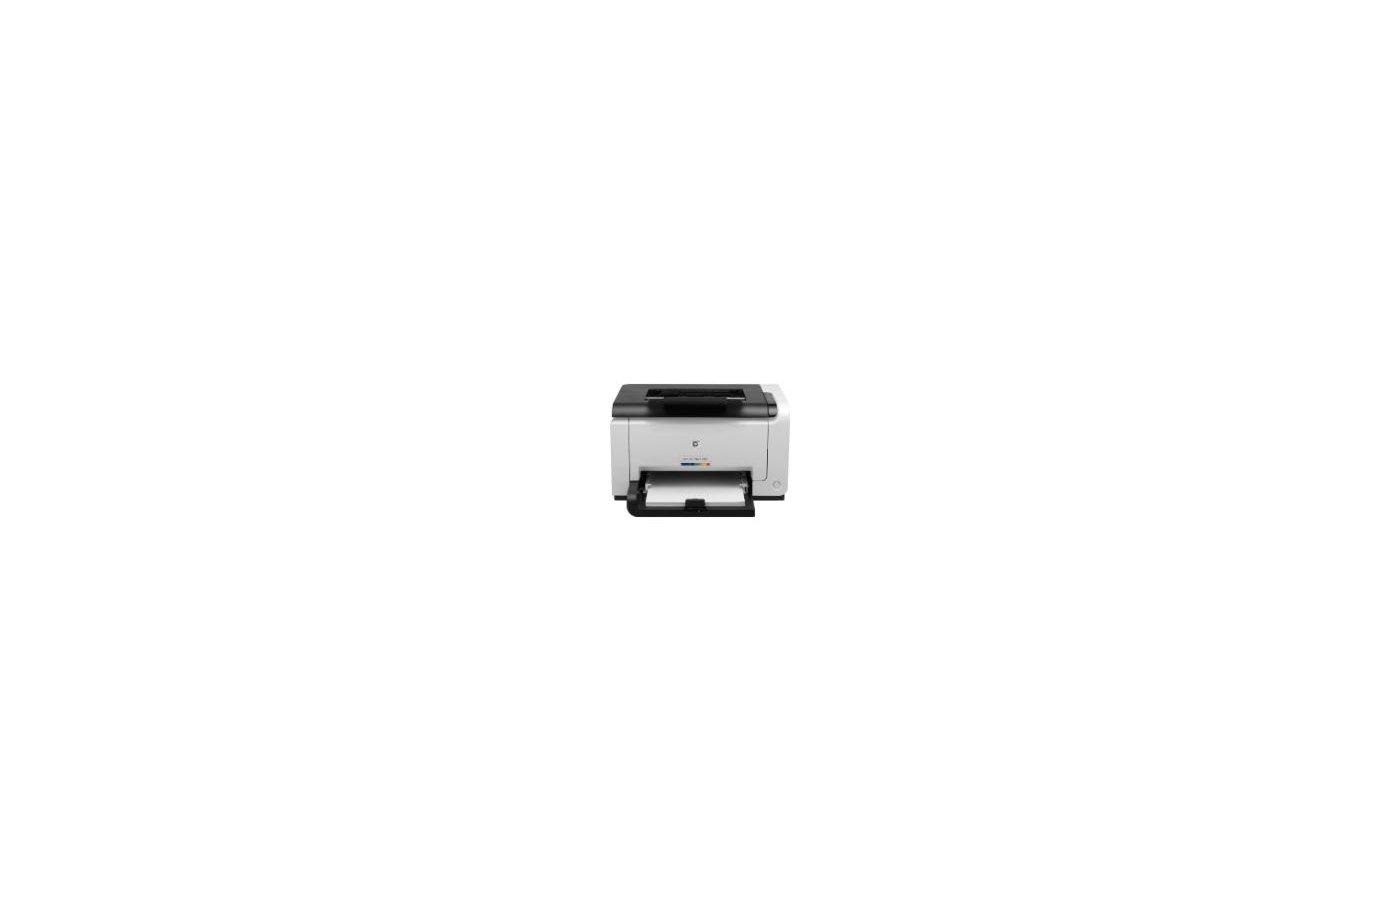 Принтер HP LaserJet CP1025nw Color Printer